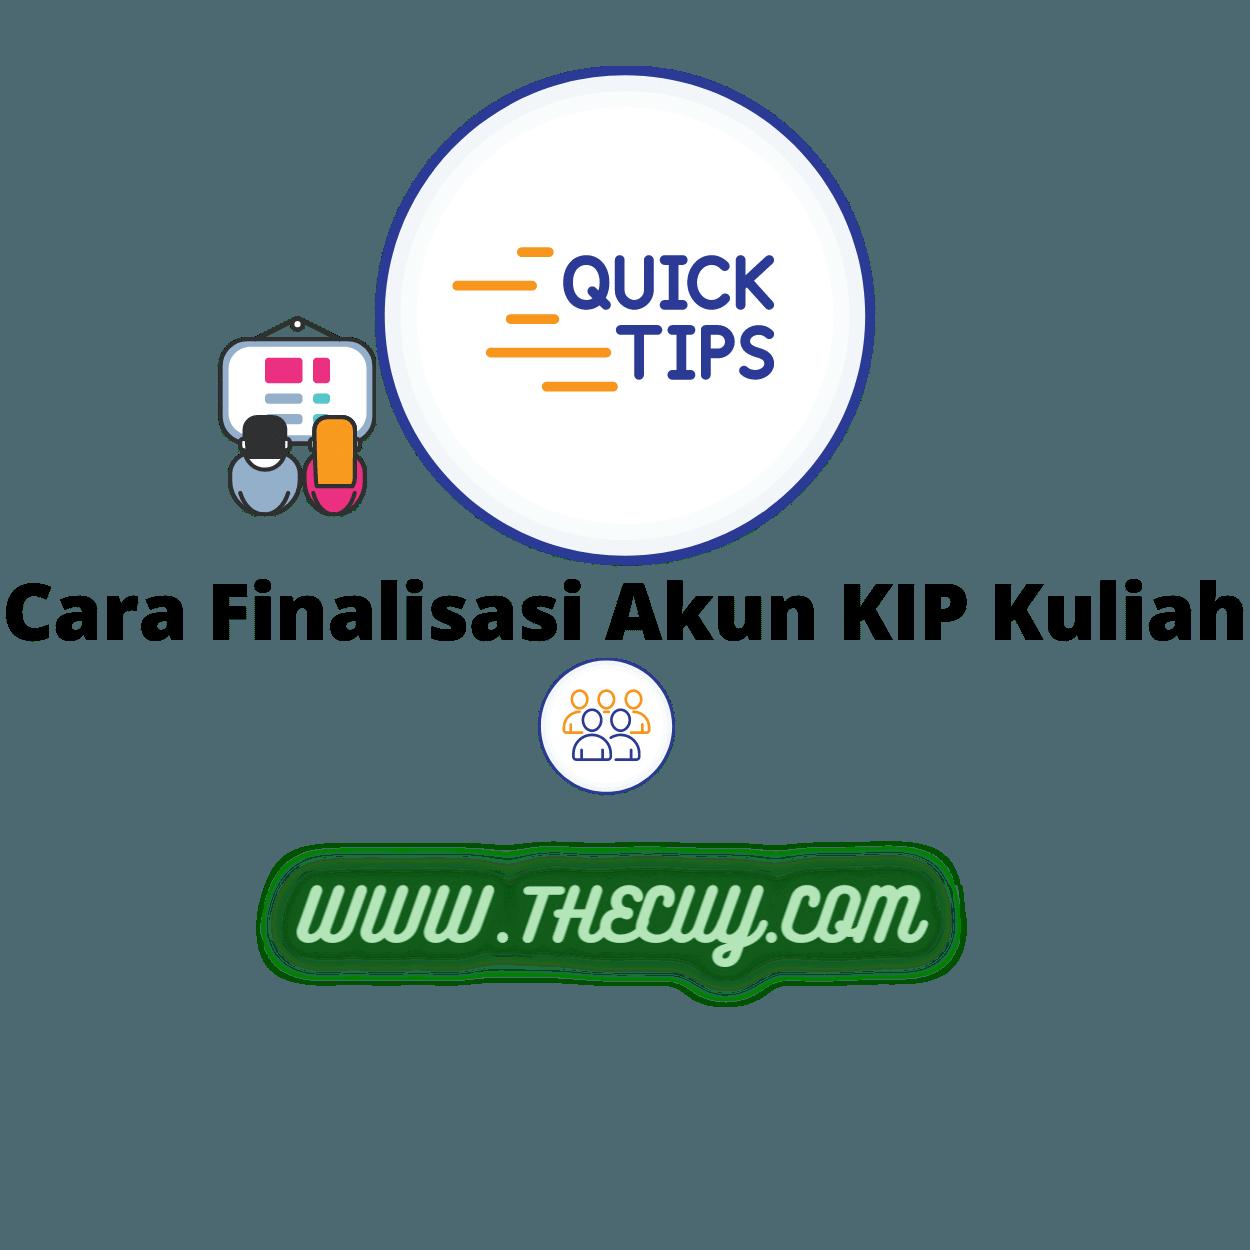 Cara Finalisasi Akun KIP Kuliah